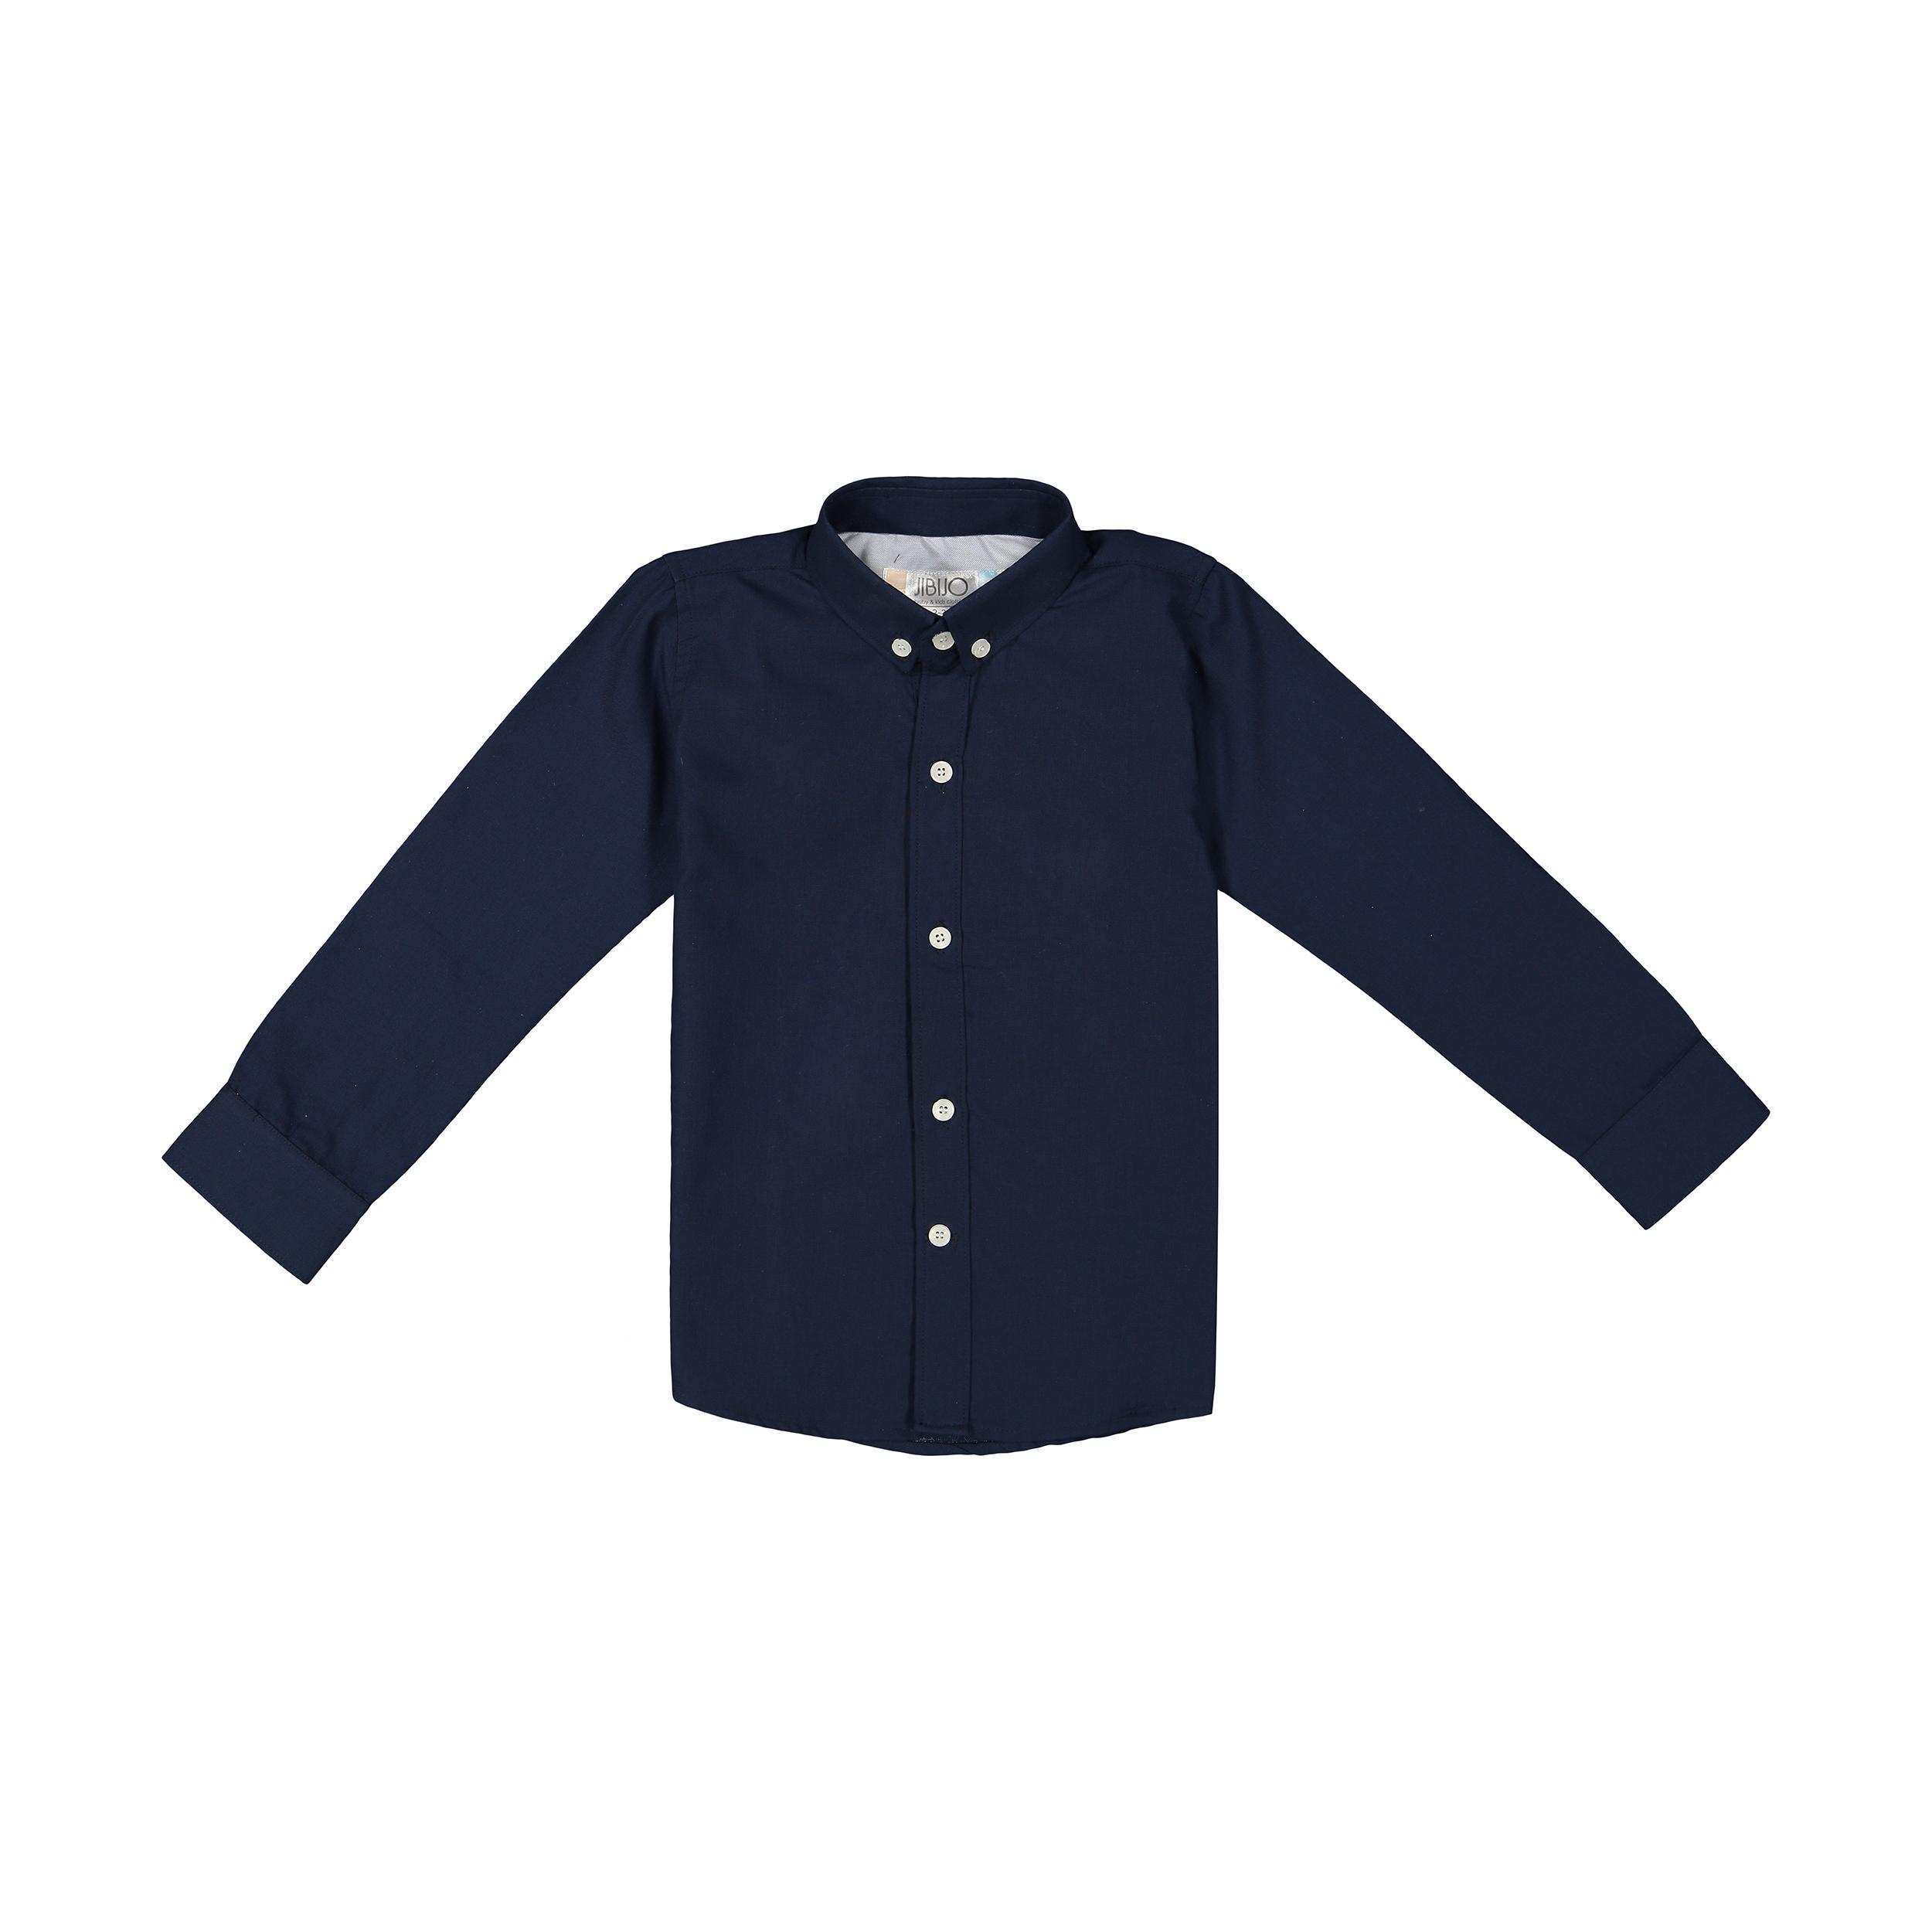 پیراهن پسرانه جیبیجو مدل 9903-3